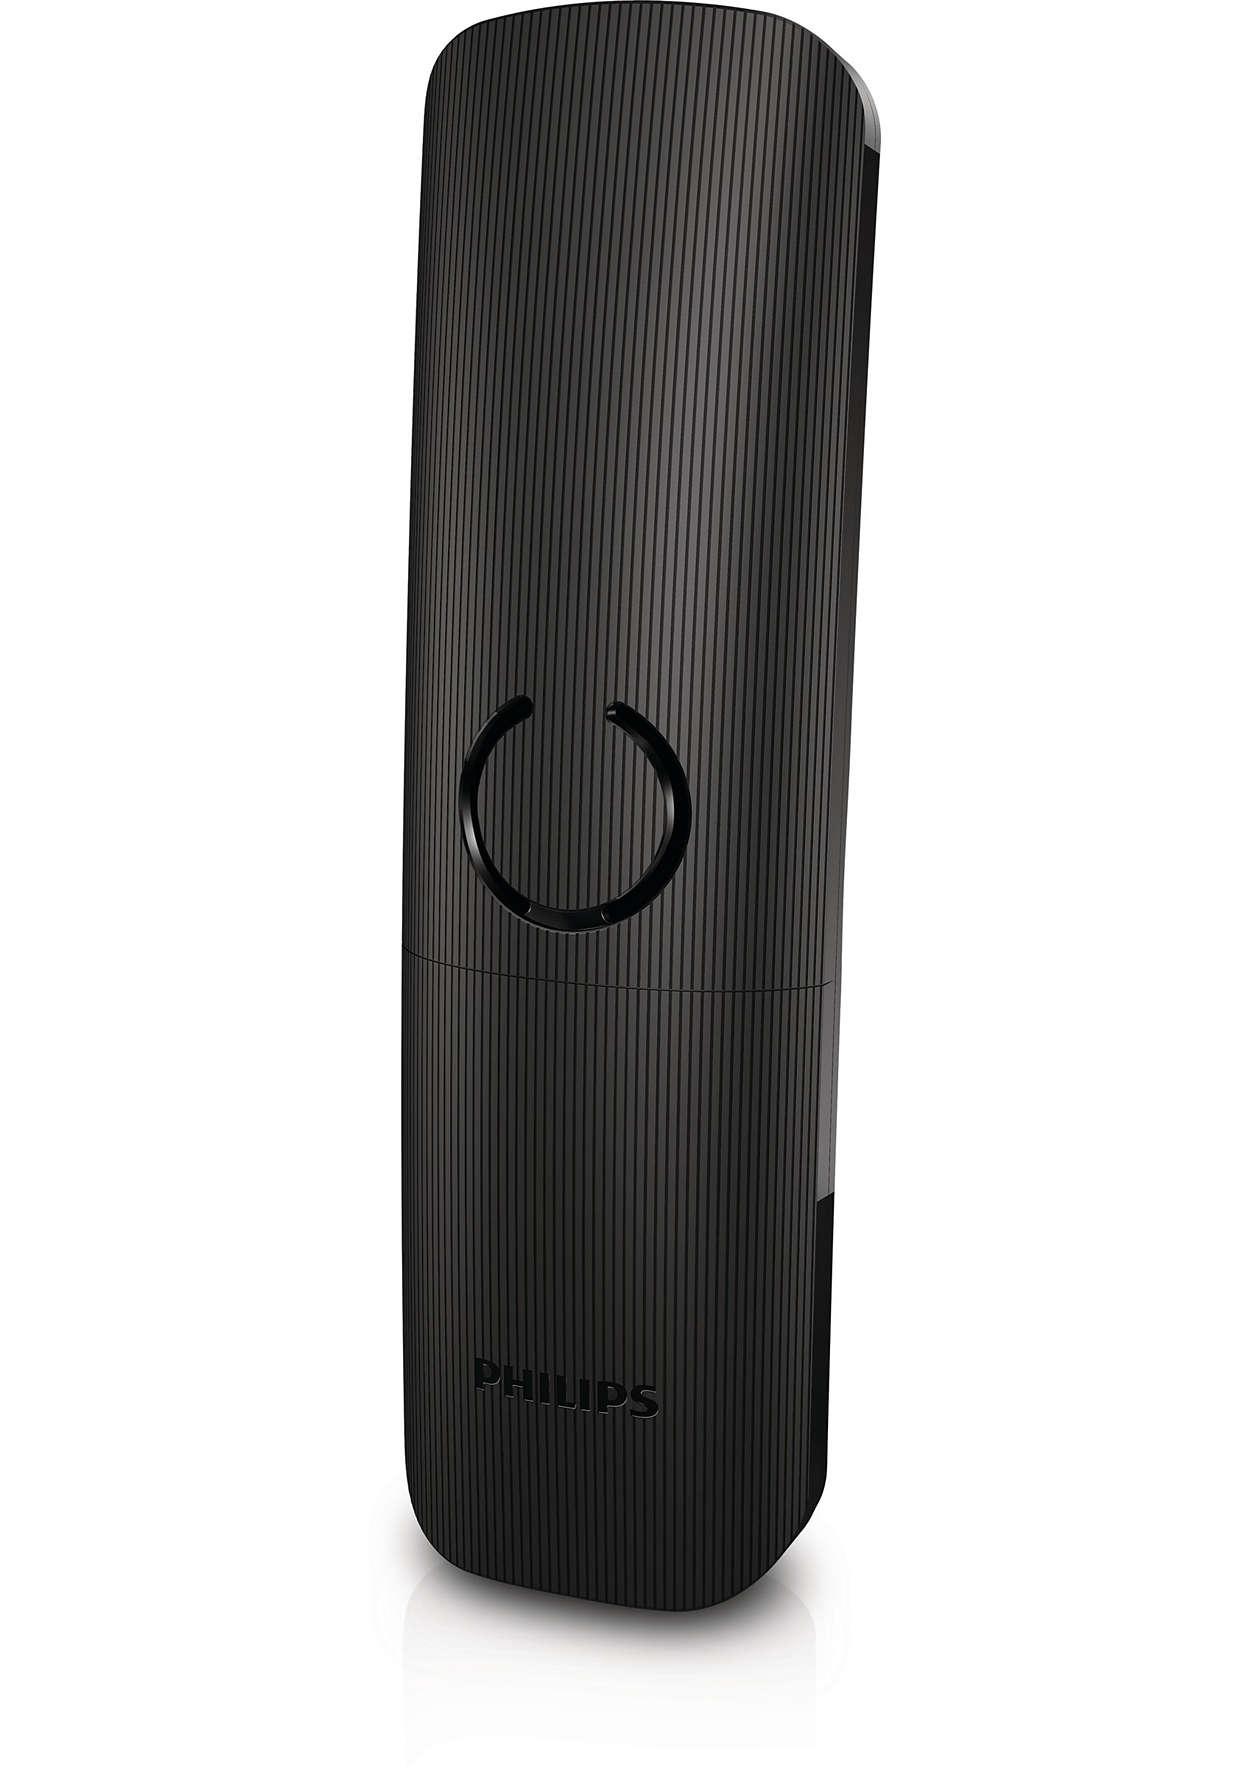 Cordless phone D6052B/05 | Philips